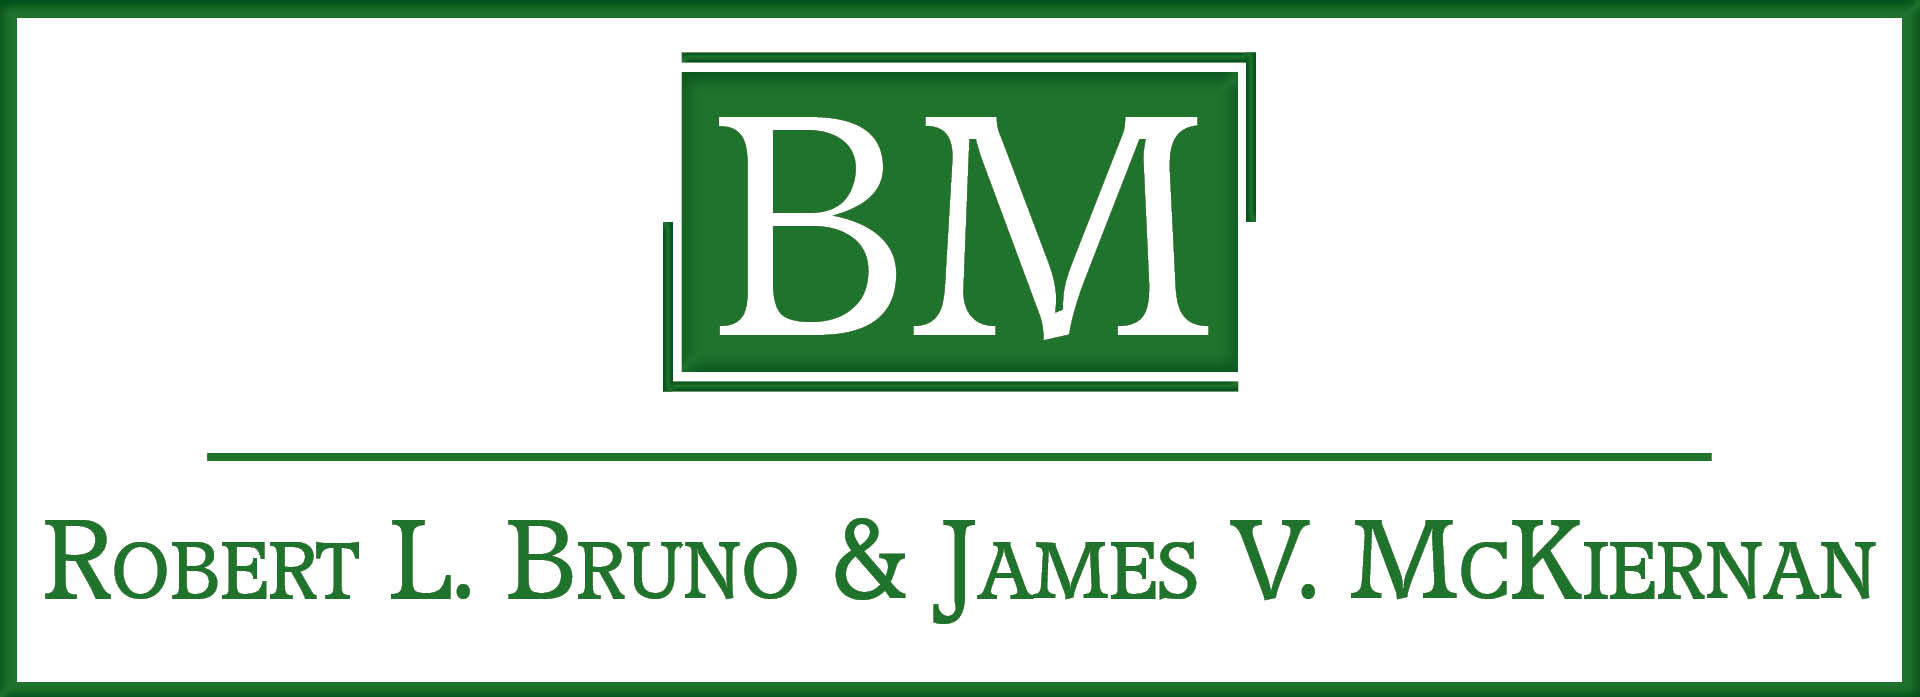 Robert L. Bruno & James V. McKiernan